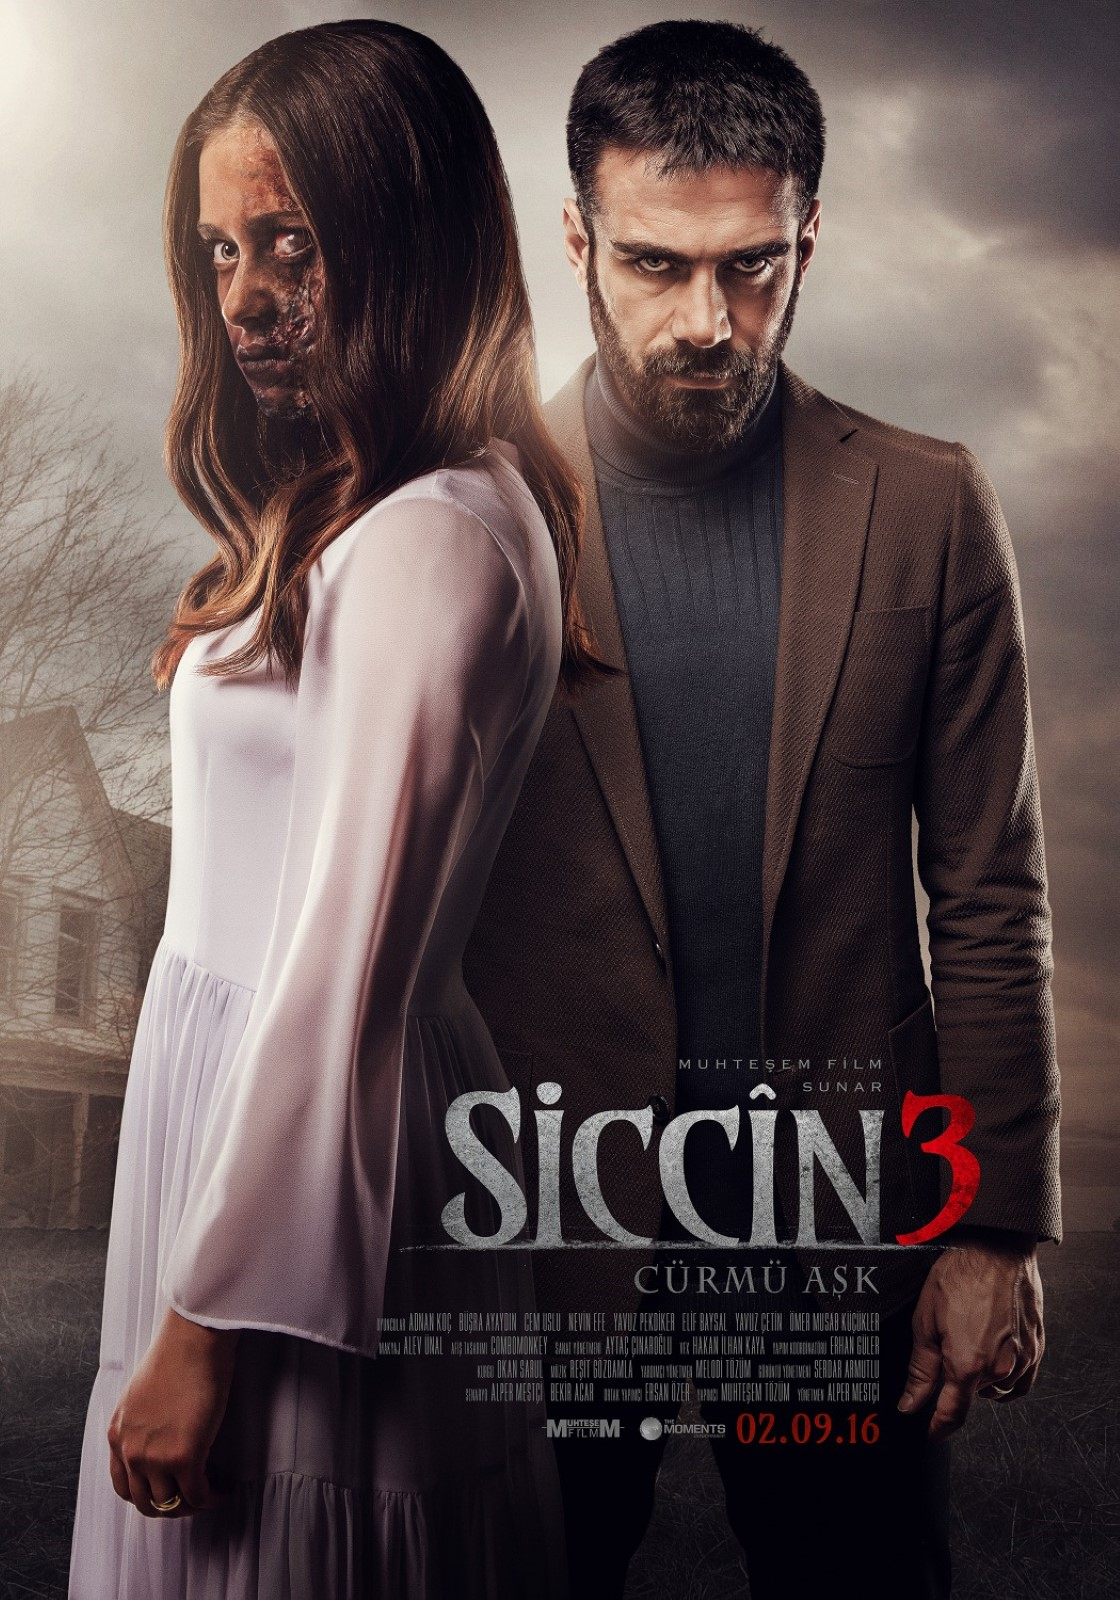 Siccin 3 Cürmü Aşk Film 2016 Beyazperdecom